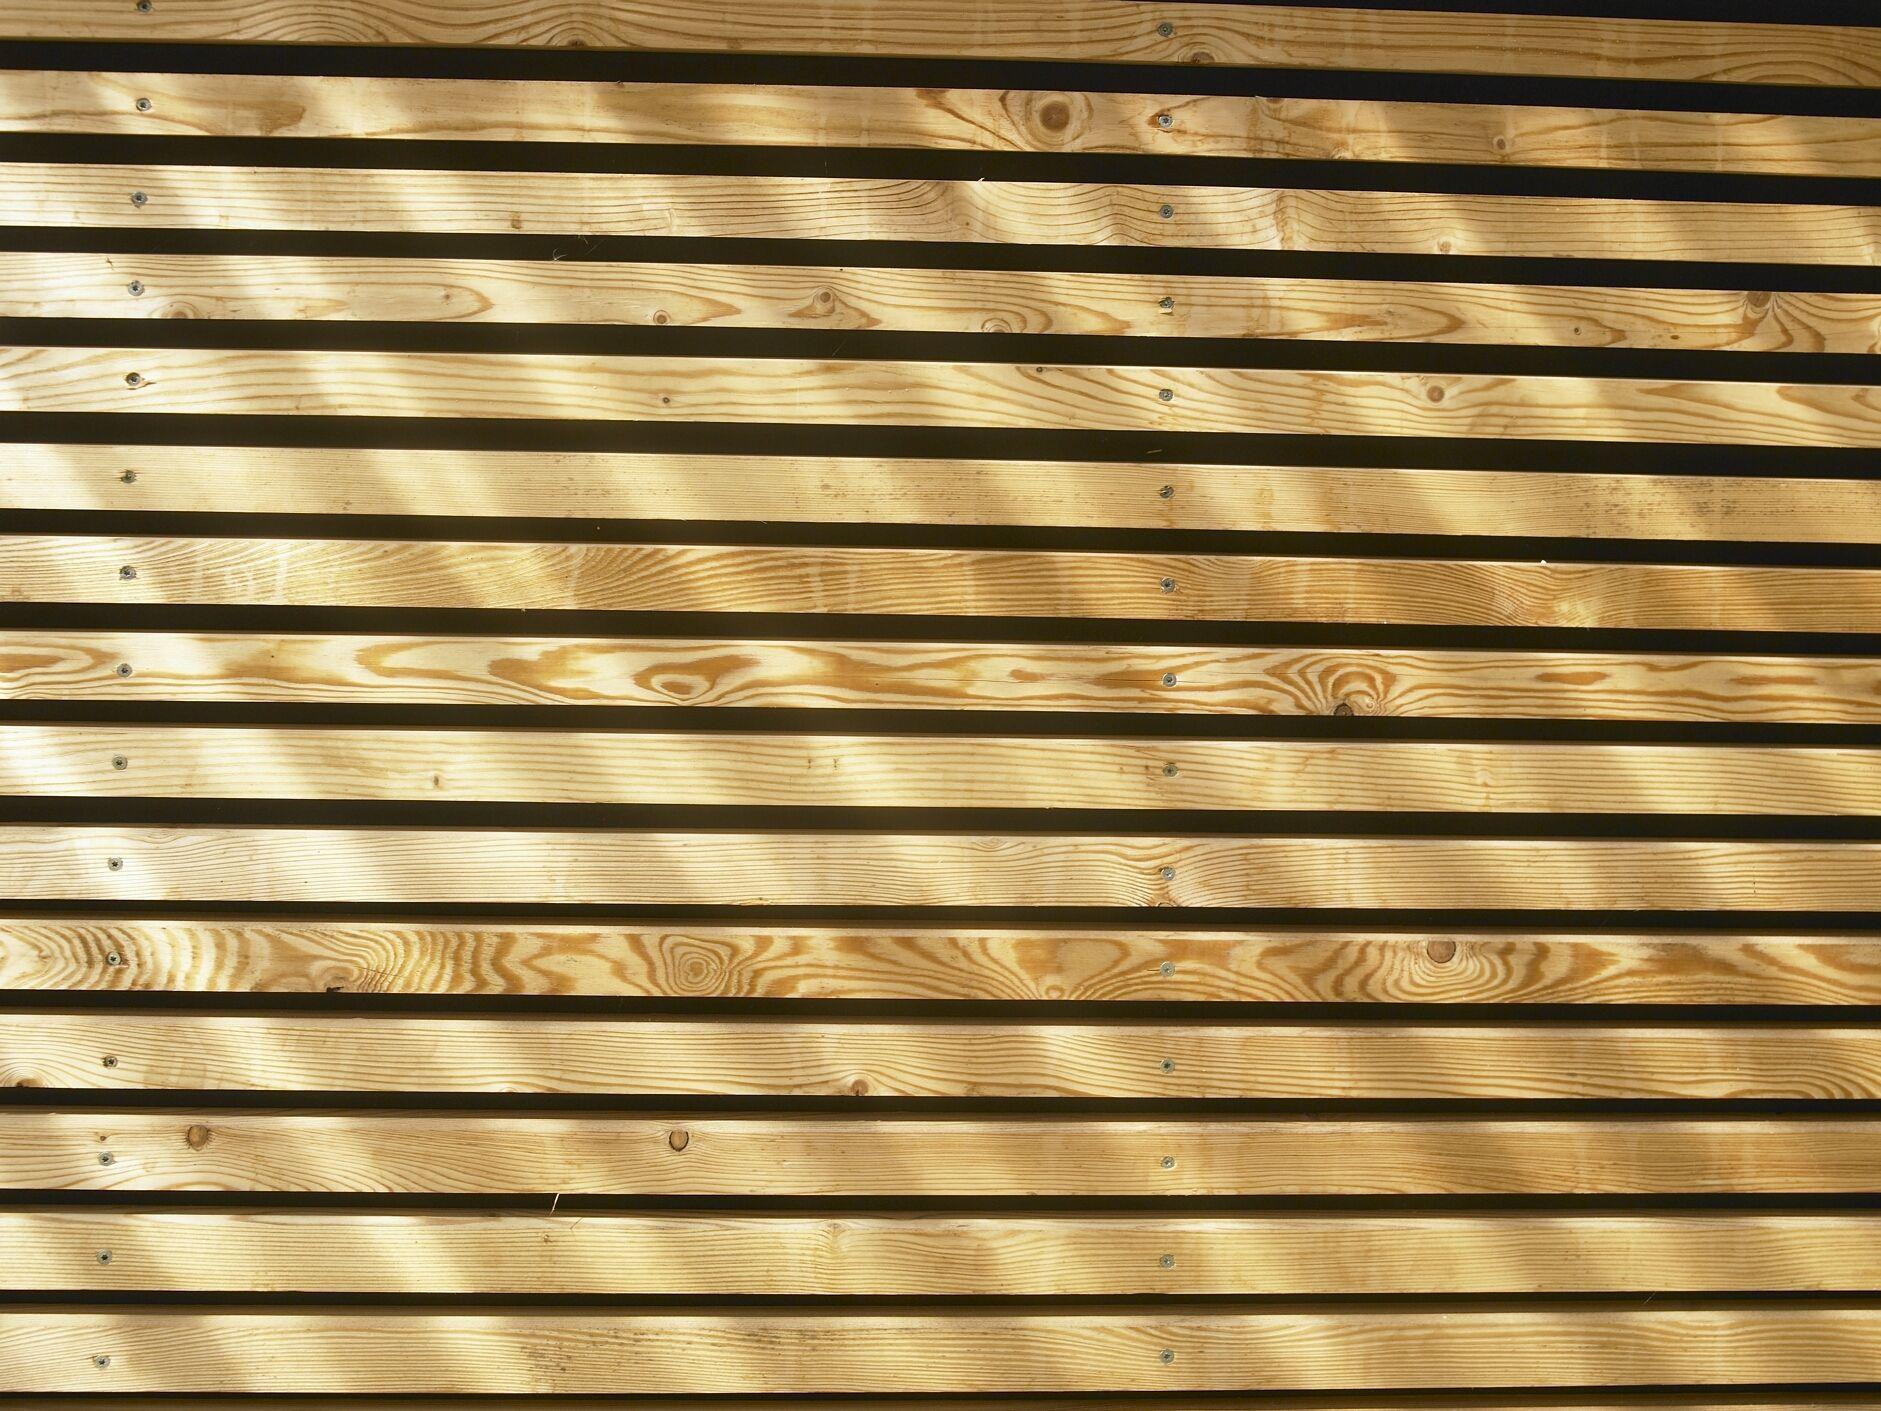 Larch Wood Batten Sommerhaus Piu Pinterest Woods